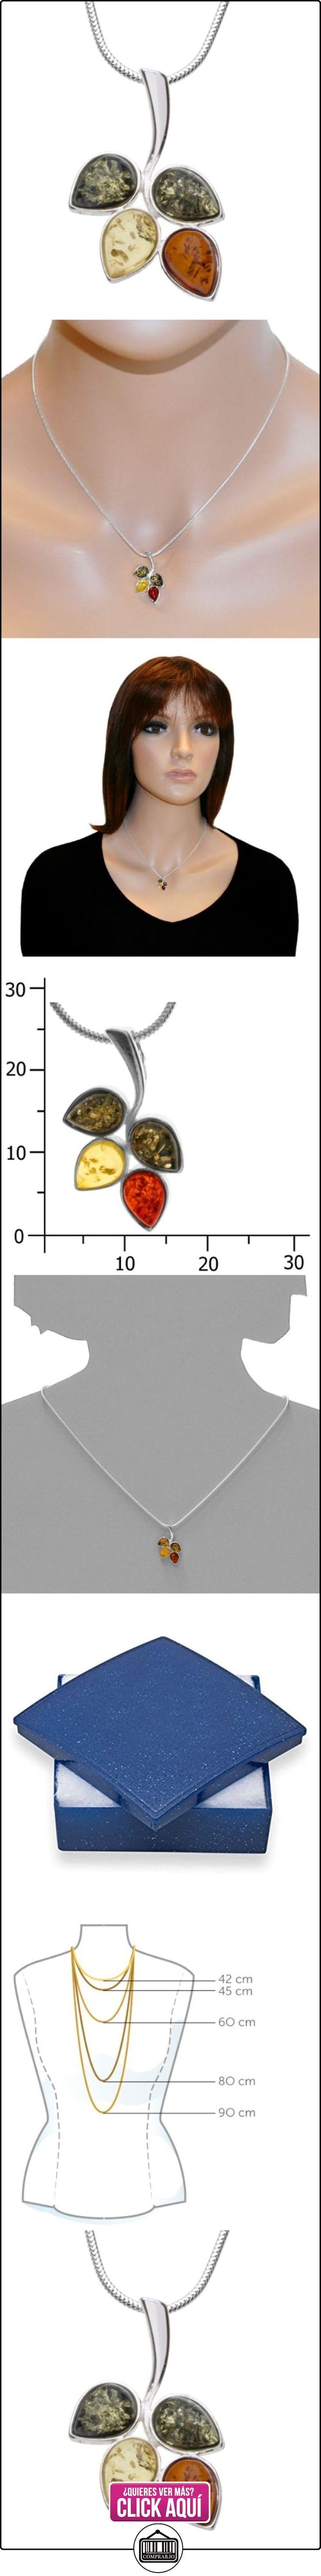 In Collections 242A204003340 - Collar de mujer de plata de ley con ámbar, 42 cm  ✿ Joyas para mujer - Las mejores ofertas ✿ ▬► Ver oferta: http://comprar.io/goto/B0054O4OQ8